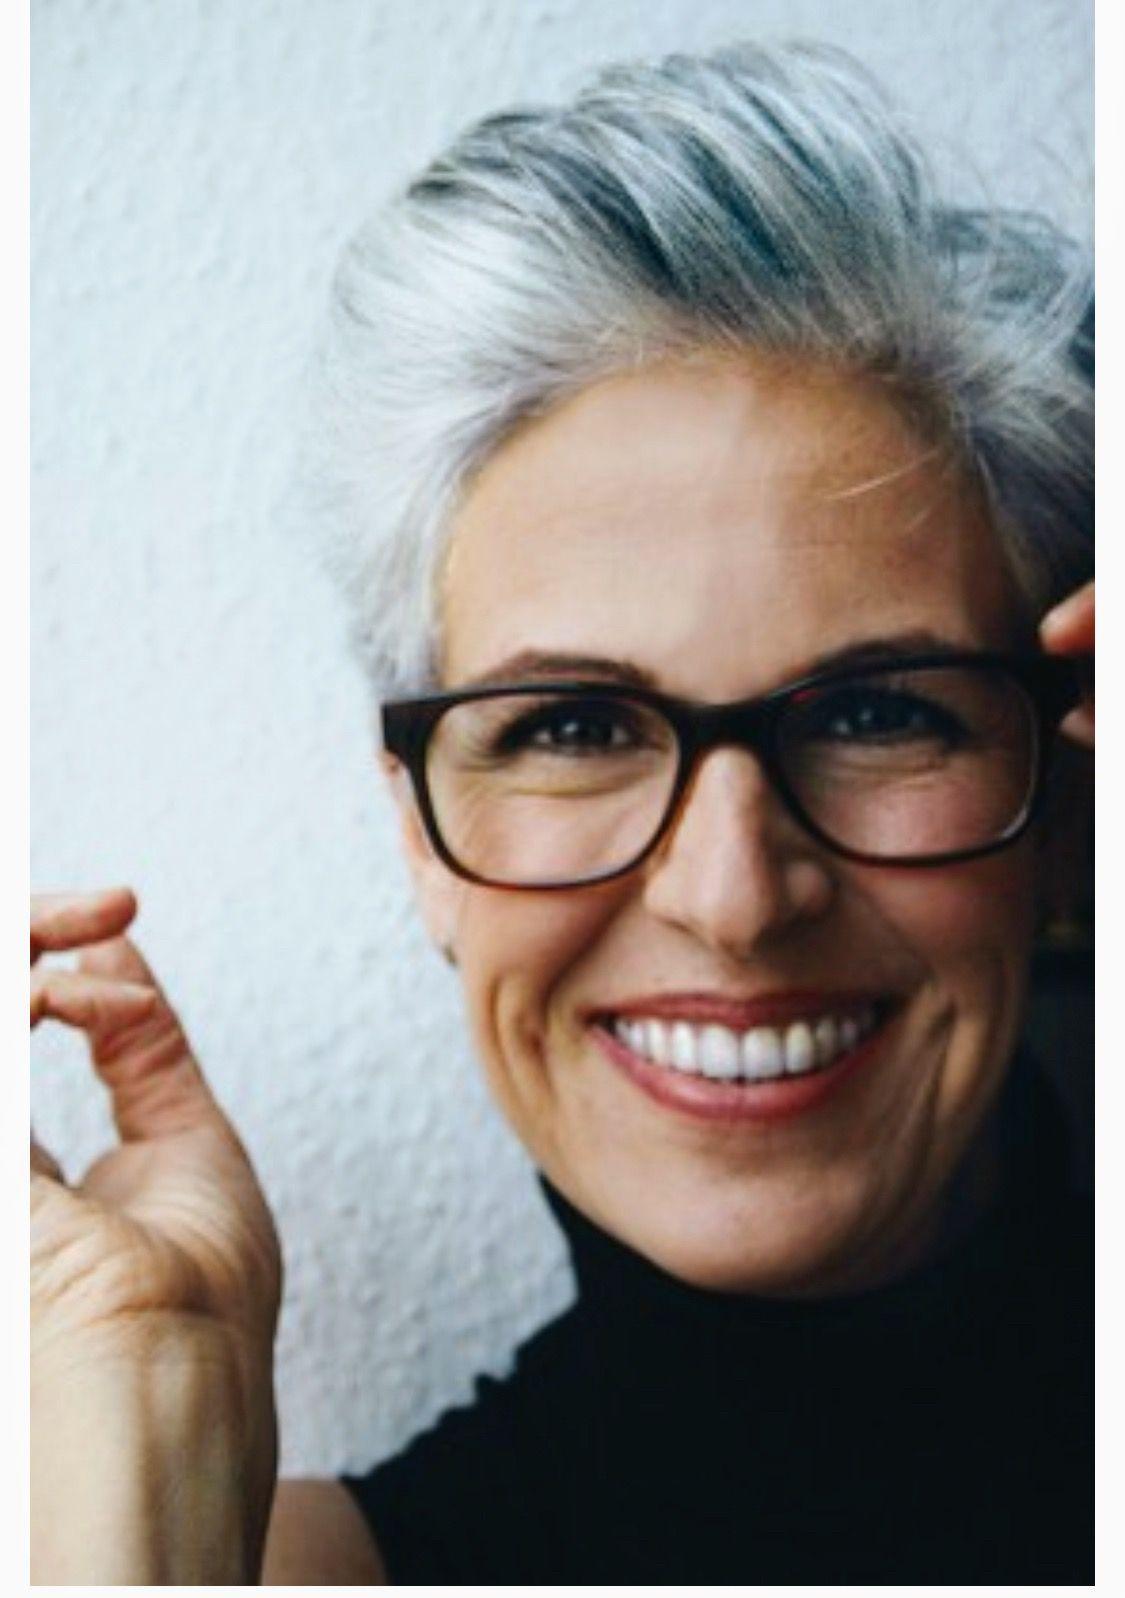 Pin Van Lisa Brochetti Op Gray Hair Tips Kort Kapsel Dames Met Bril Kort Kapsel Bril Kort Grijs Haar